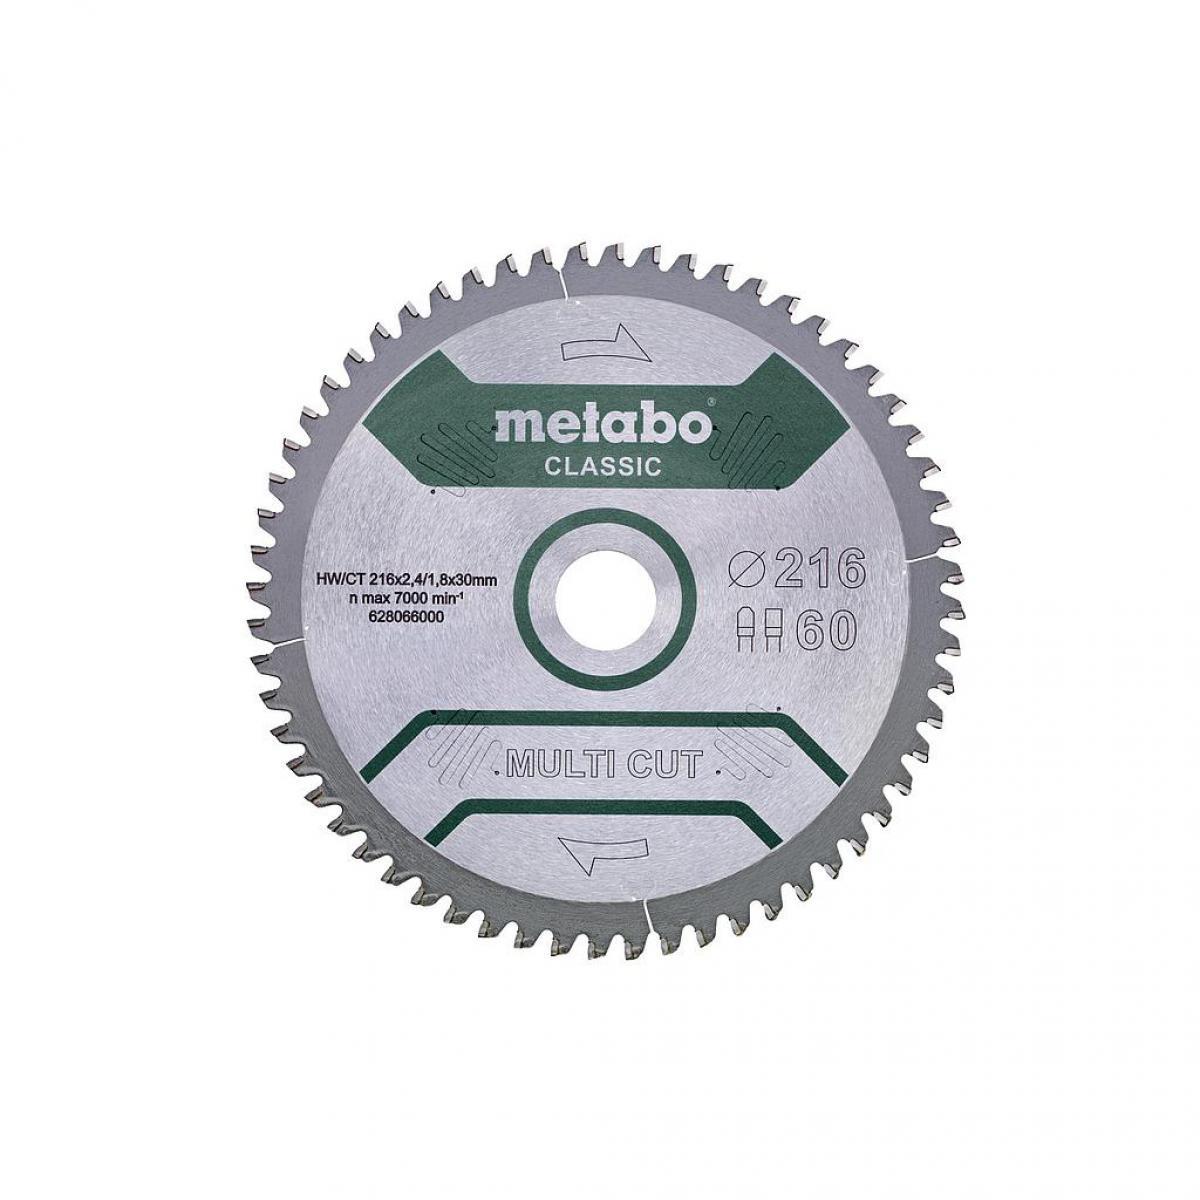 Metabo Metabo - Lame de scie circulaire 216x2.4x30mm 60 dents HW/CT